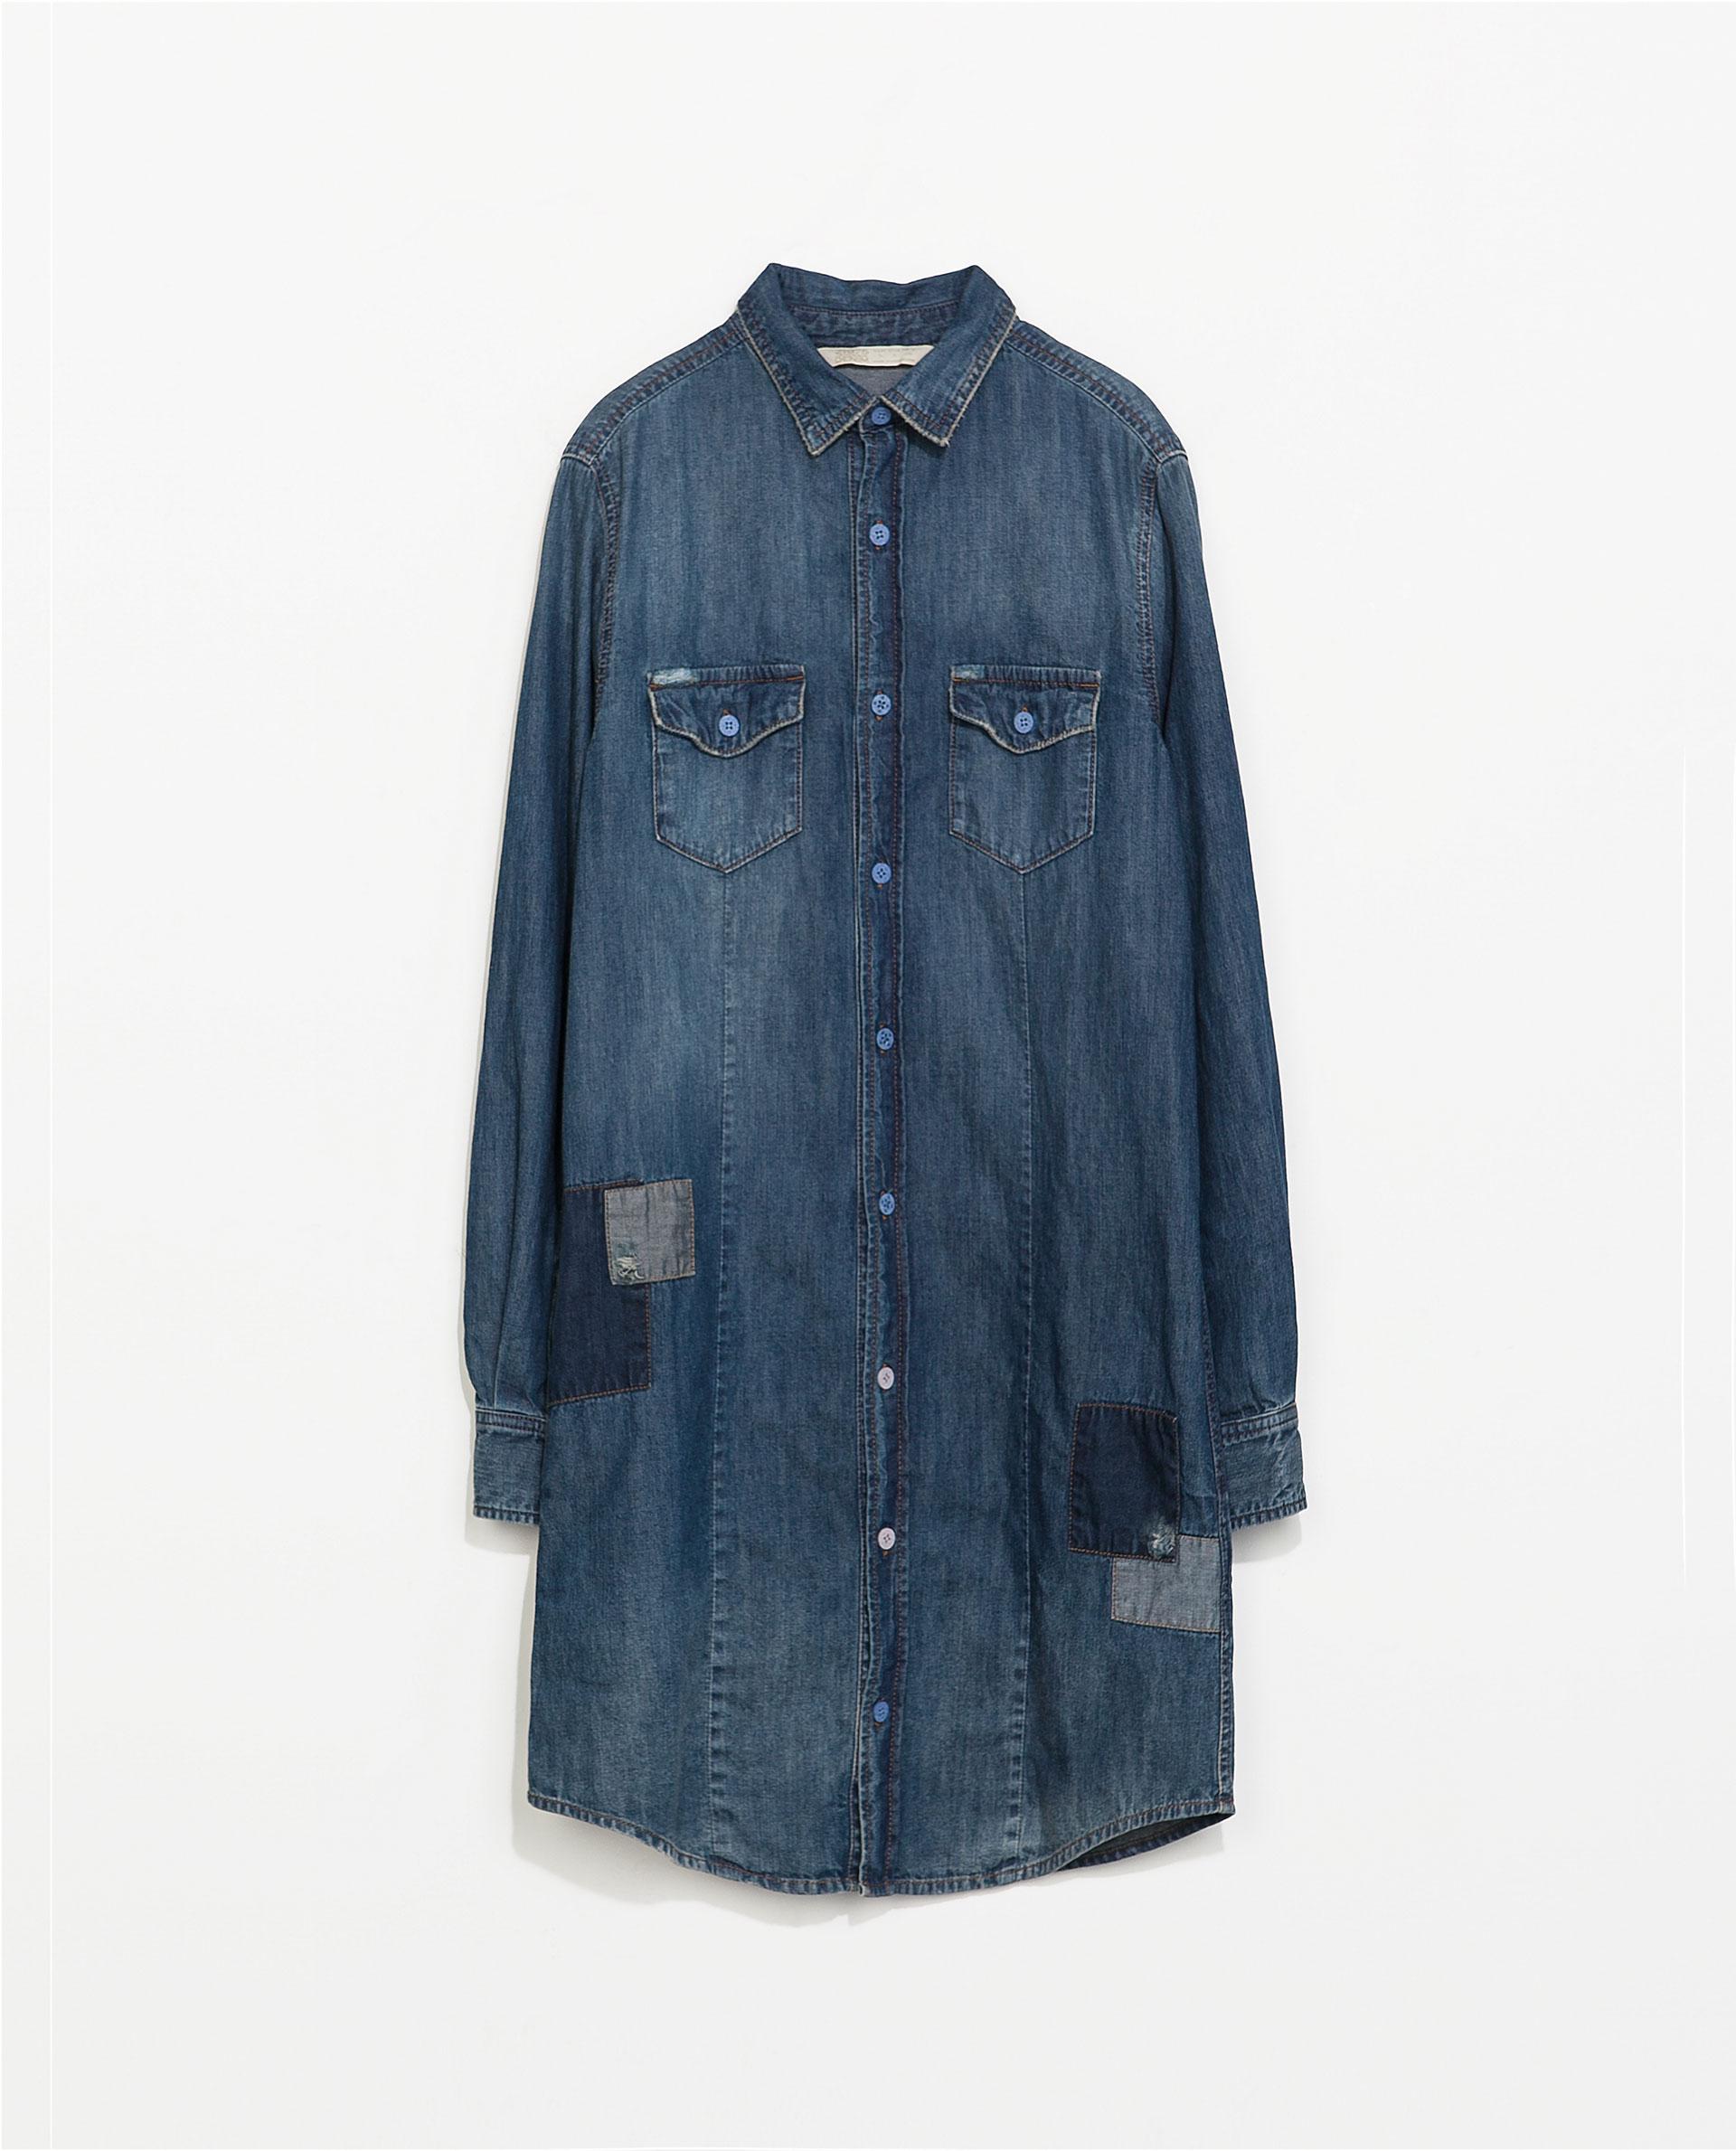 Zara Denim Shirt Dress images